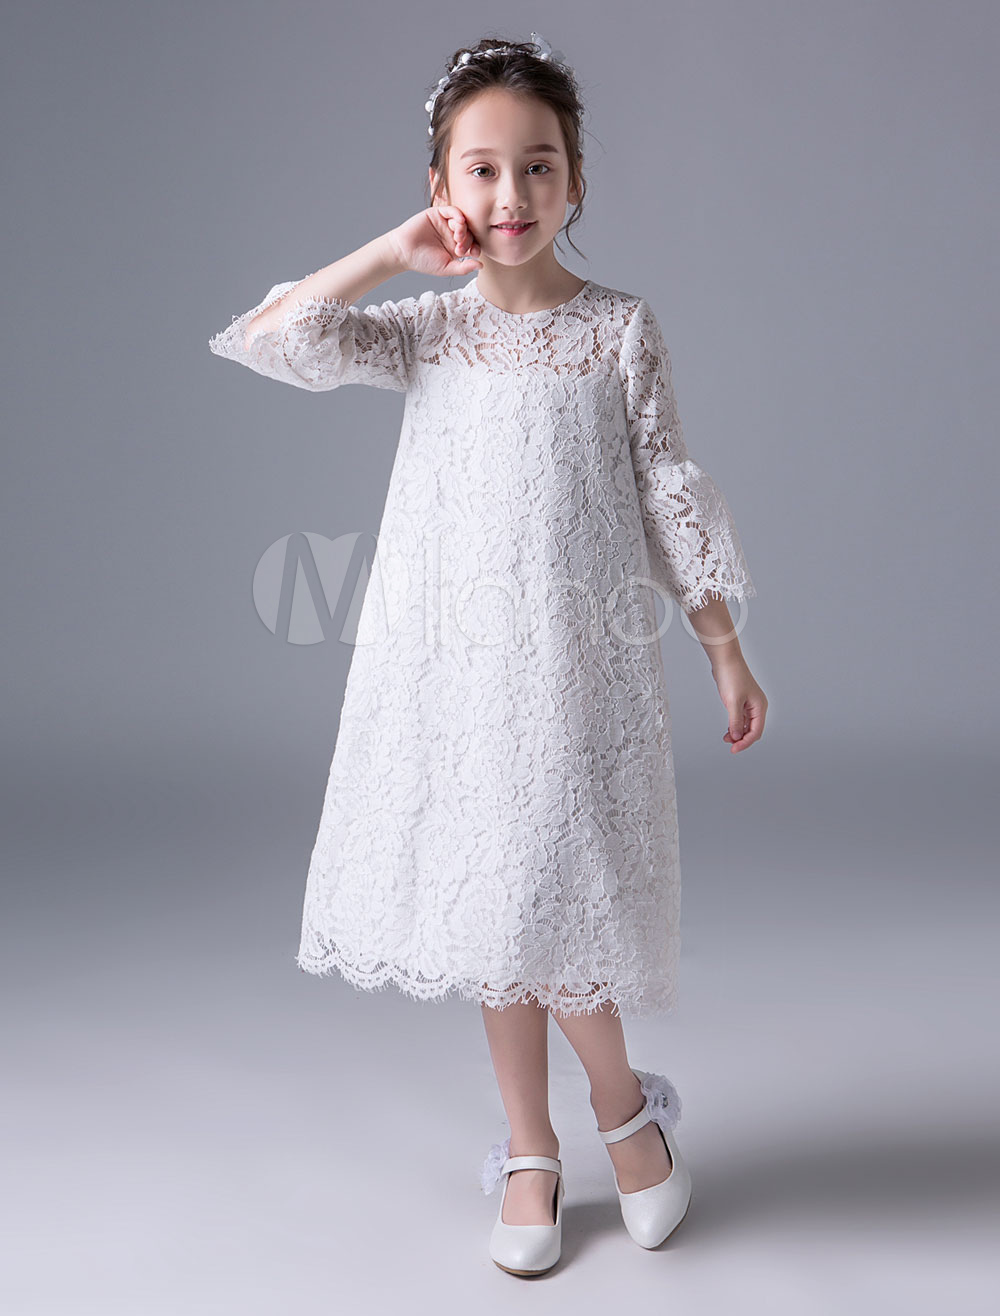 16168929a Boho Flower Girl Dresses Summer Ivory Lace Bell Sleeve Tea Length ...